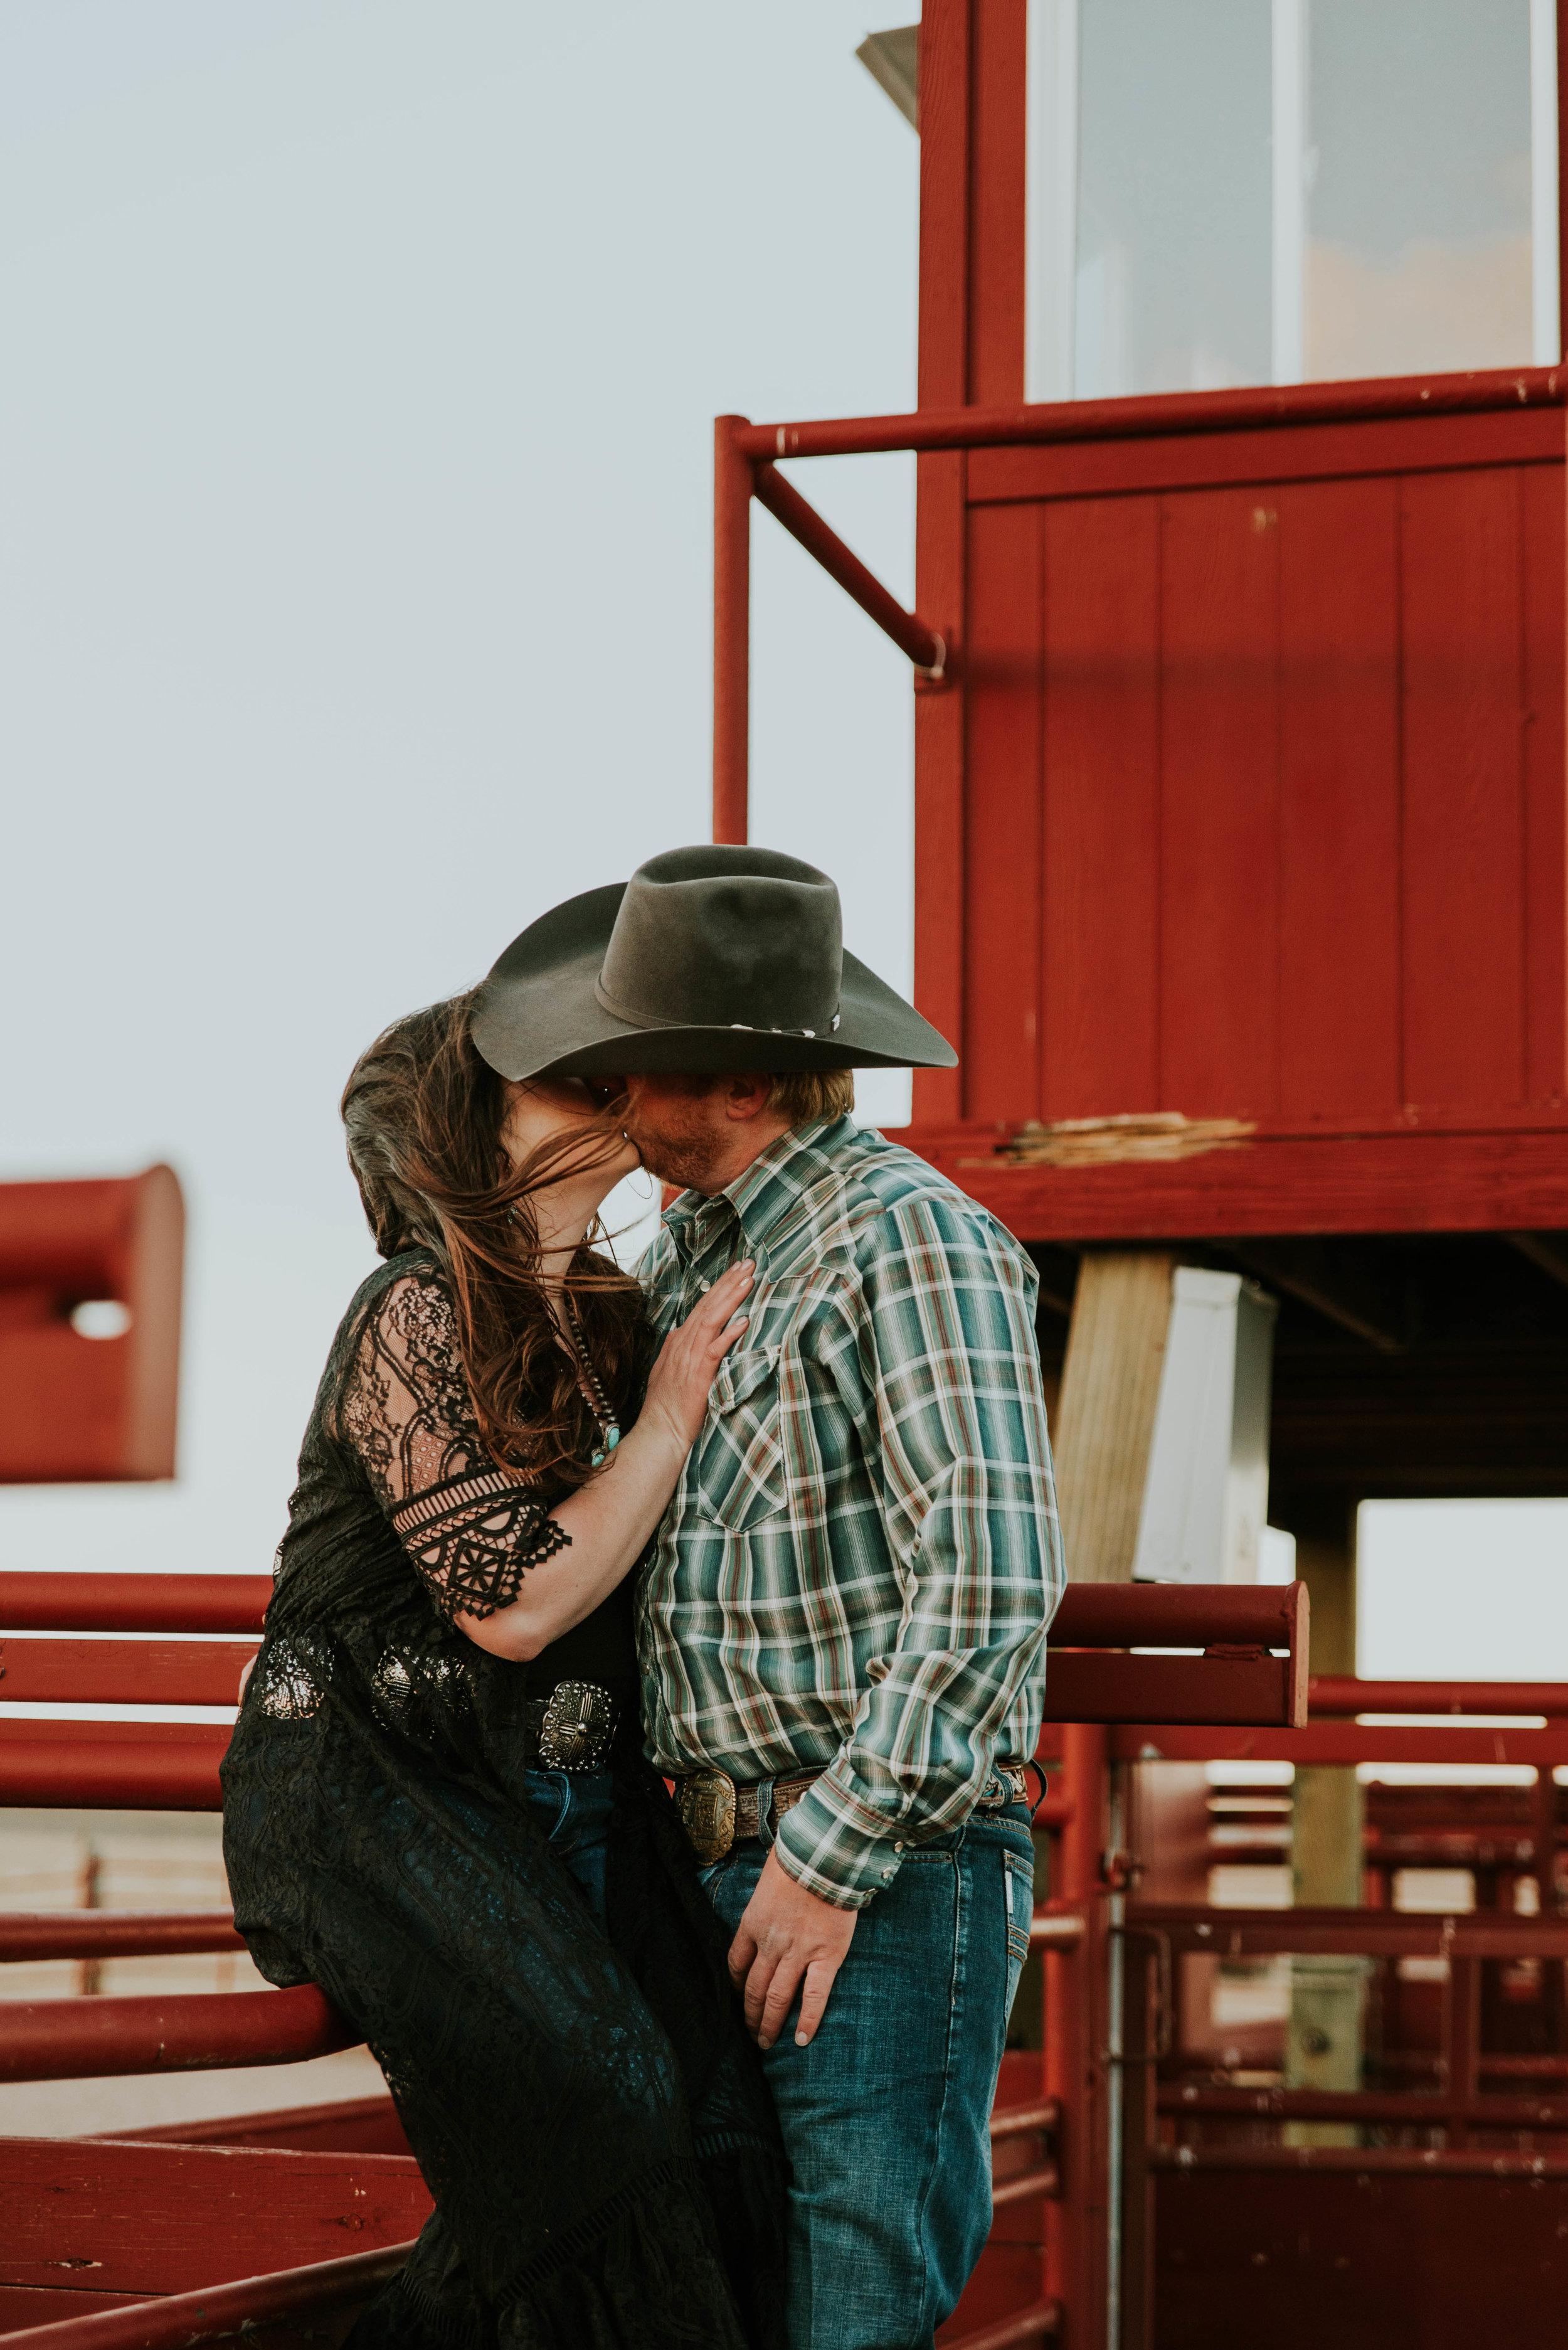 Wyoming Wedding Photographer | Laramie Wyoming | Cheyenne Wyoming | Colorado Wedding Photographer | Miss. Miller's Photography | Buckskin Bride | Western Wedding | Ranch Wedding Photos